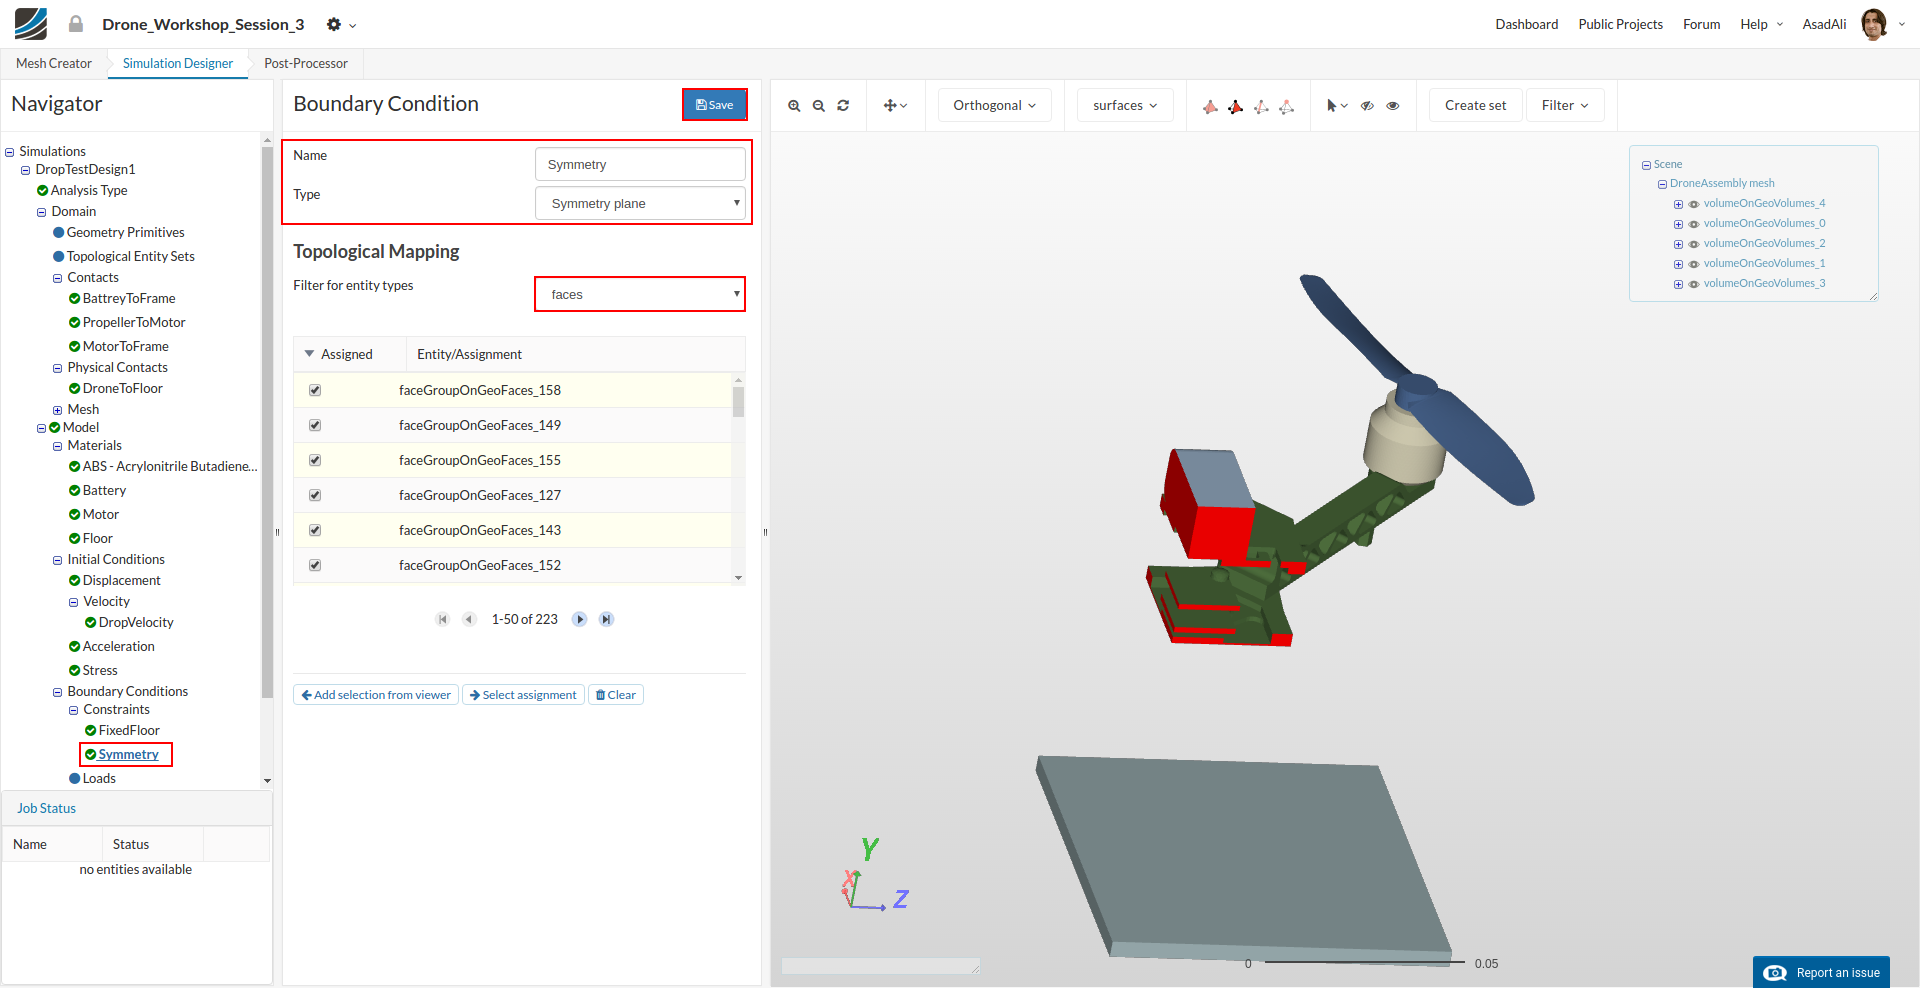 Step-by-Step Tutorial DroneS3 - Drone Design Workshop